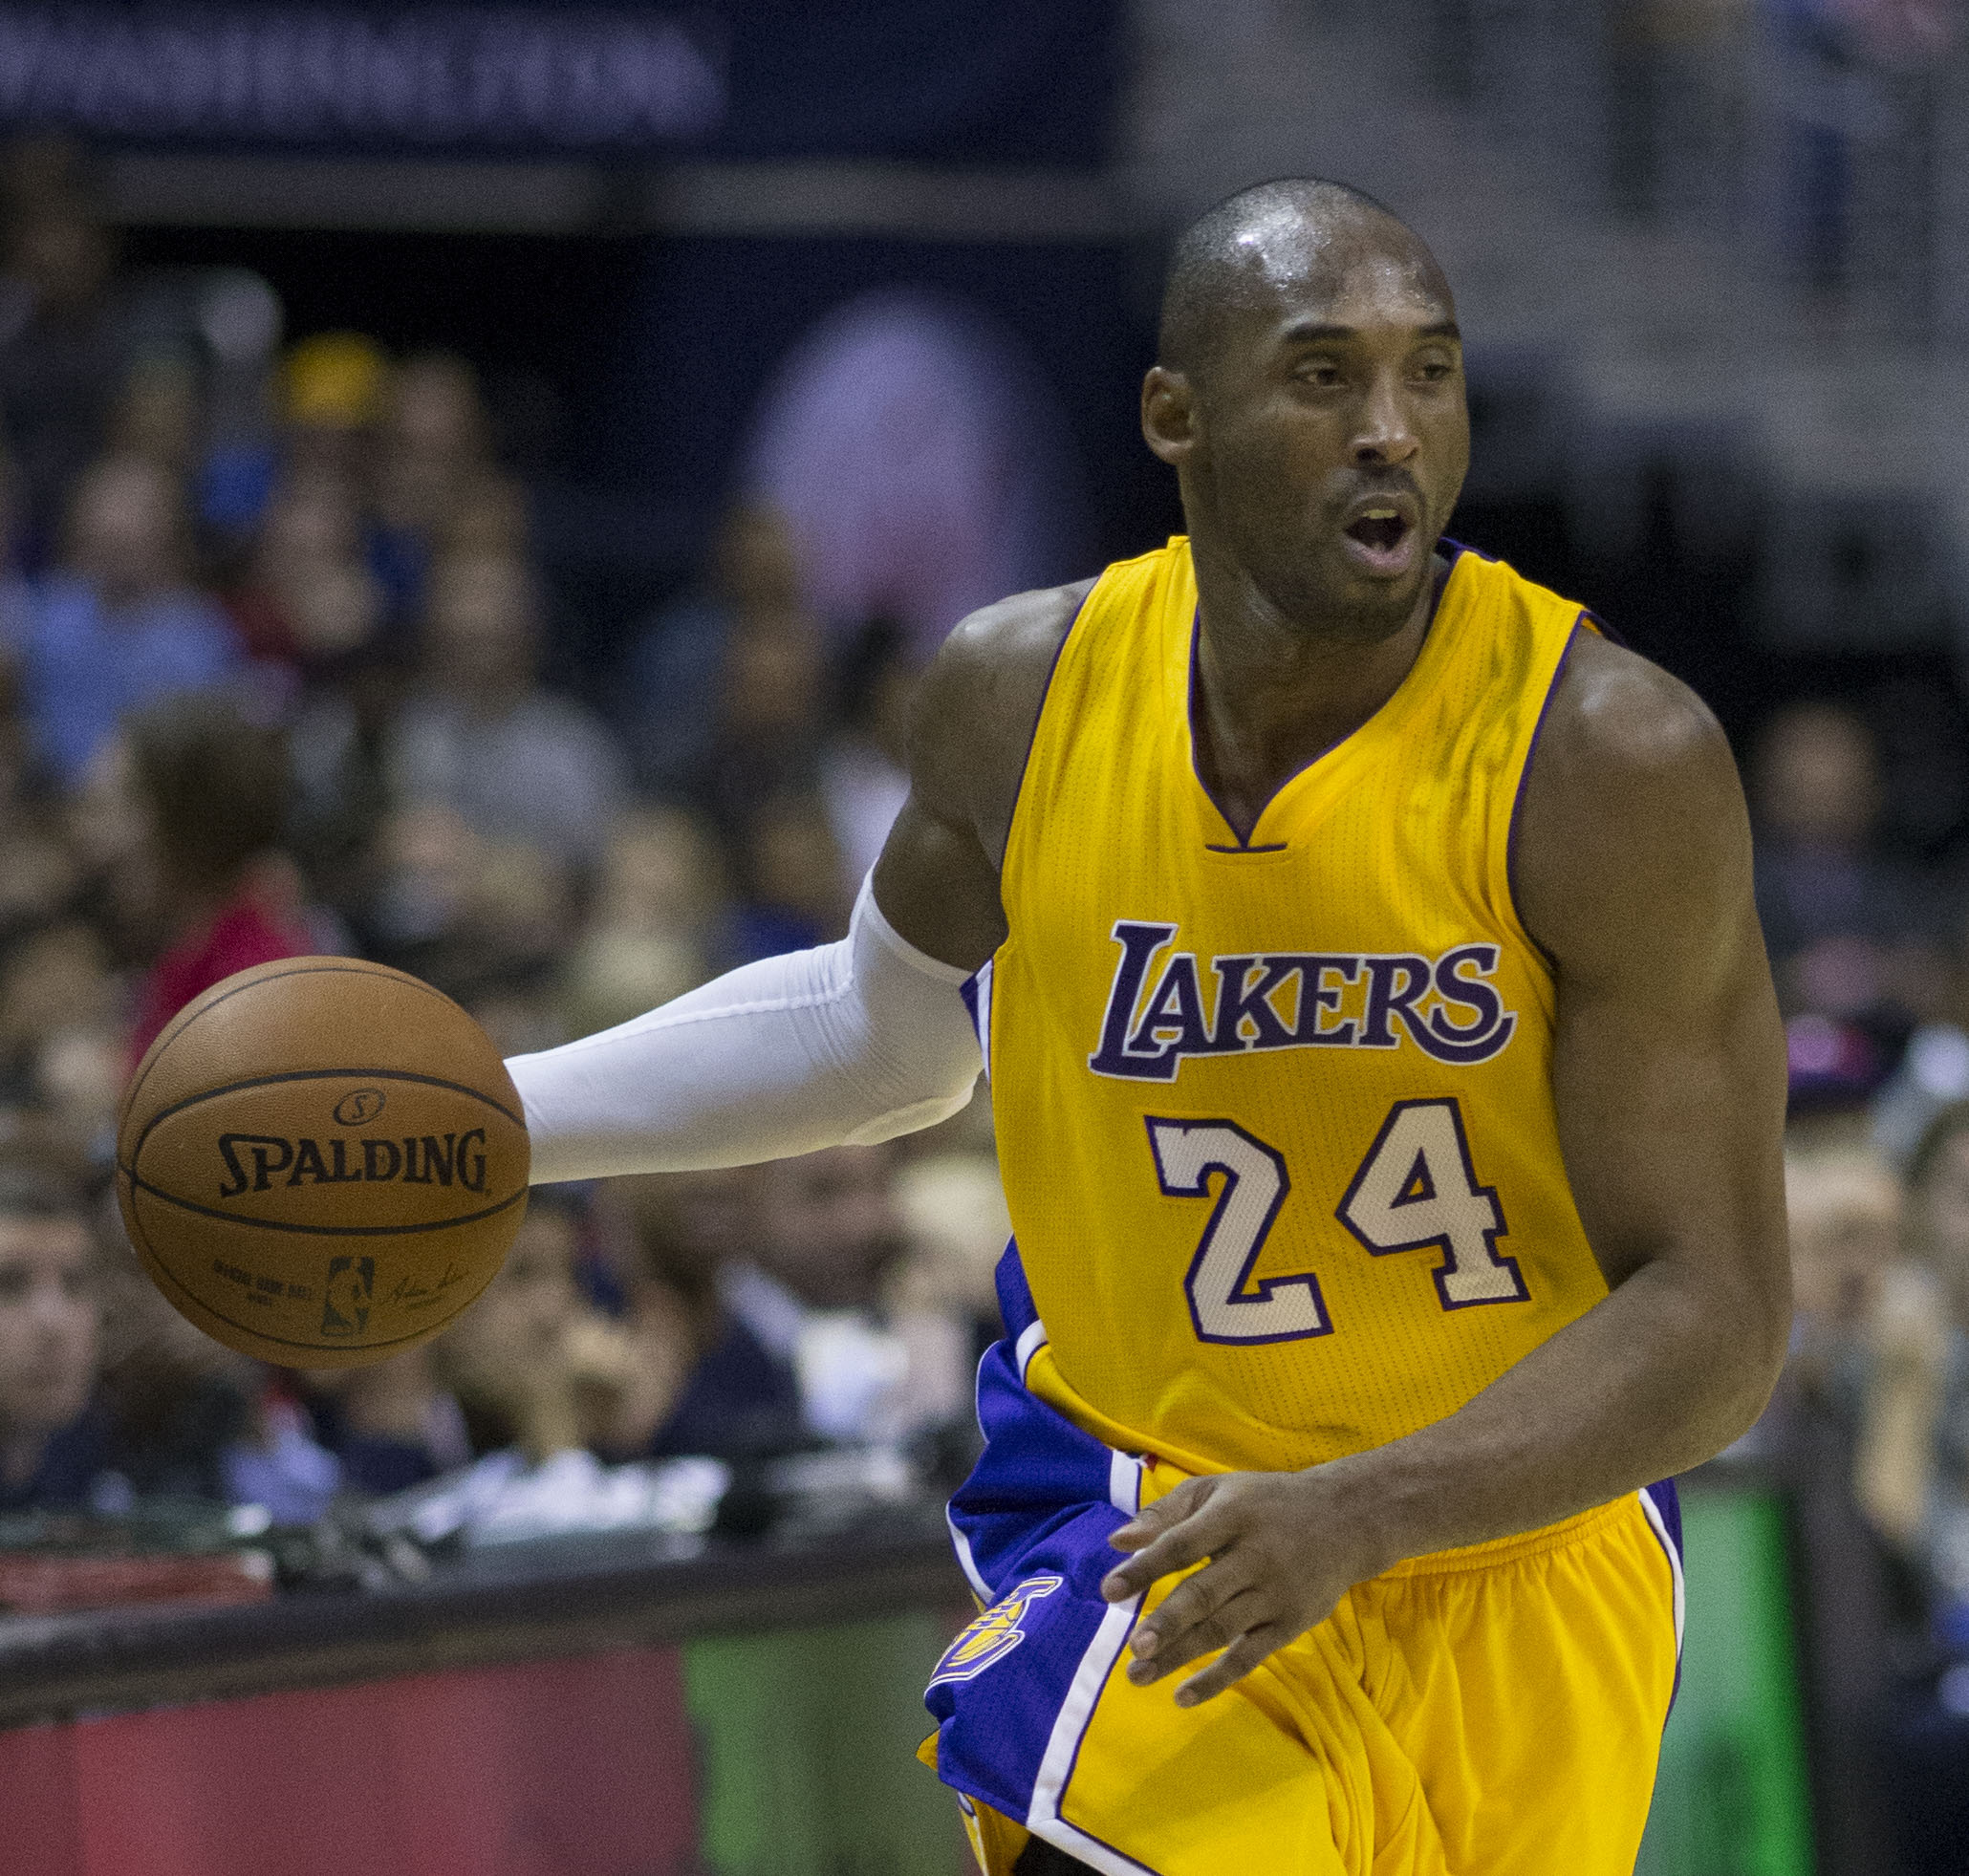 File:Kobe Bryant Dec 2014.jpg - Wikimedia Commons